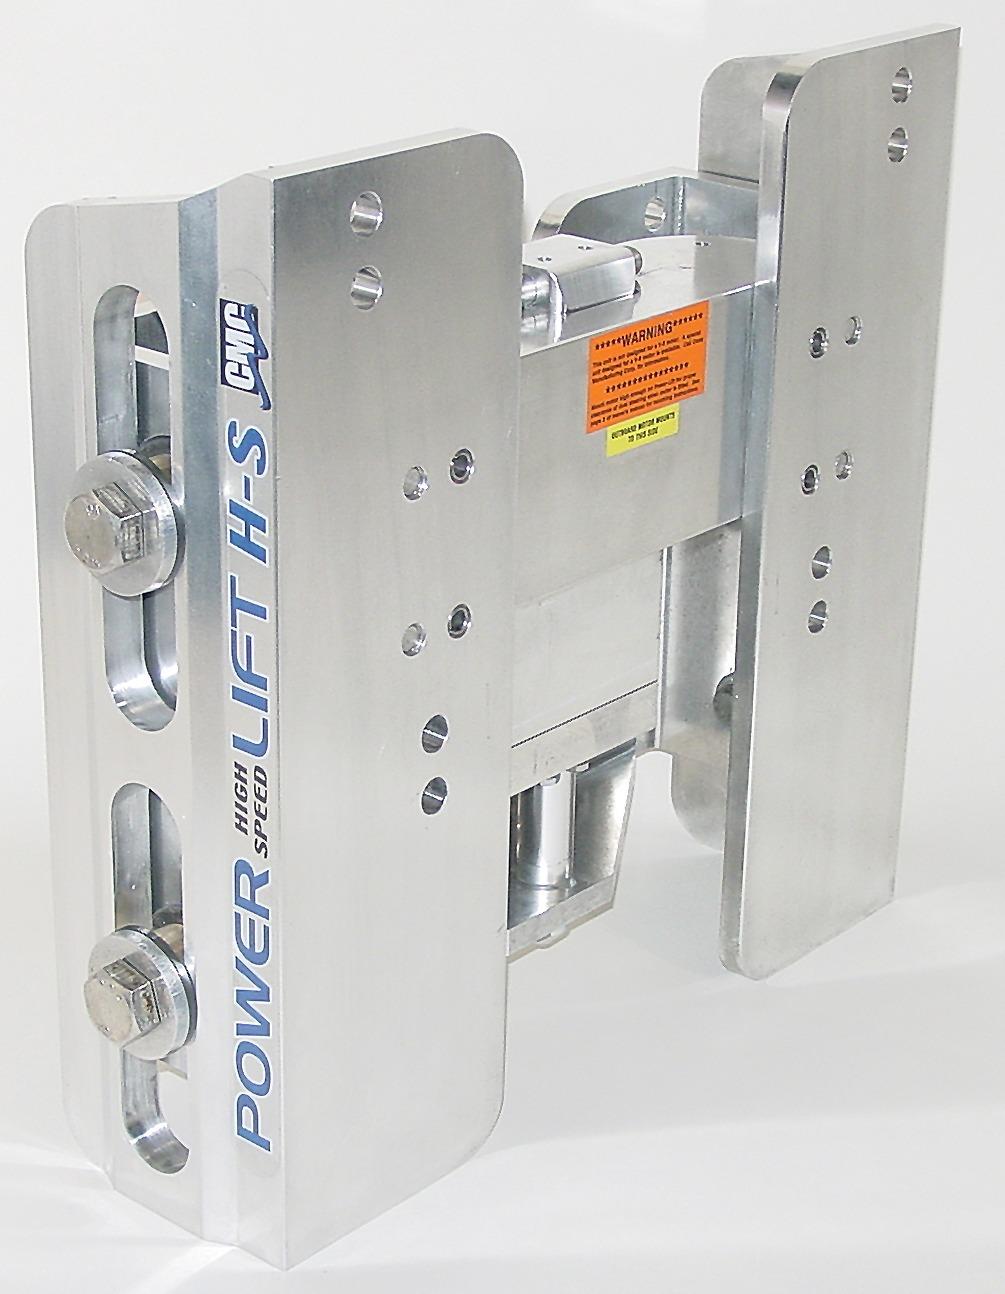 PL-65-HS Hydraulic Jack Plate on cmc jack plate parts diagram, trailer jack wiring diagram, cmc jack plate installation, cmc tilt and trim plate, cmc jack plate solenoid, cmc jack plate circuit breaker,